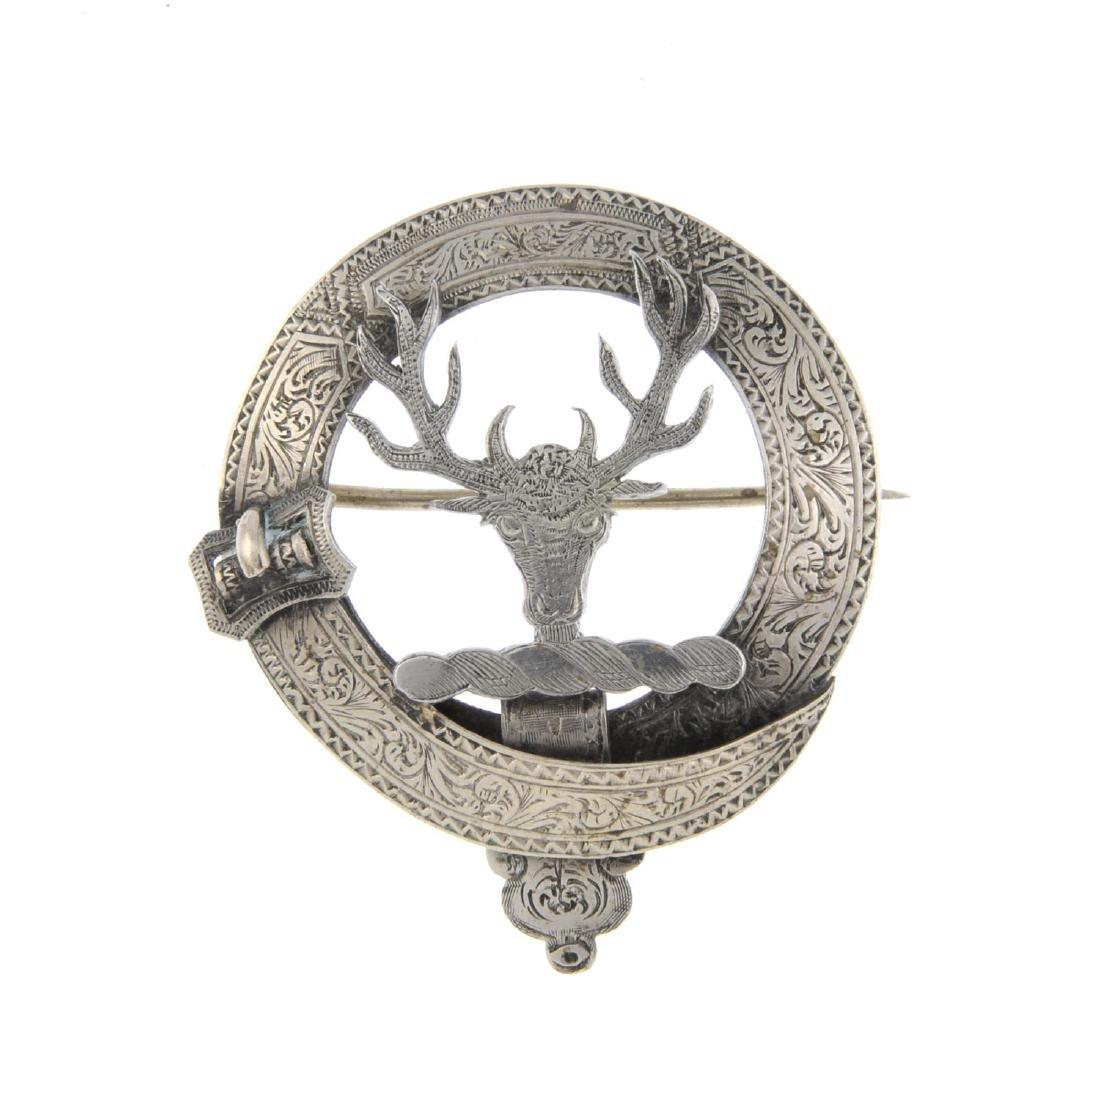 Twelve items of Scottish design jewellery. To include